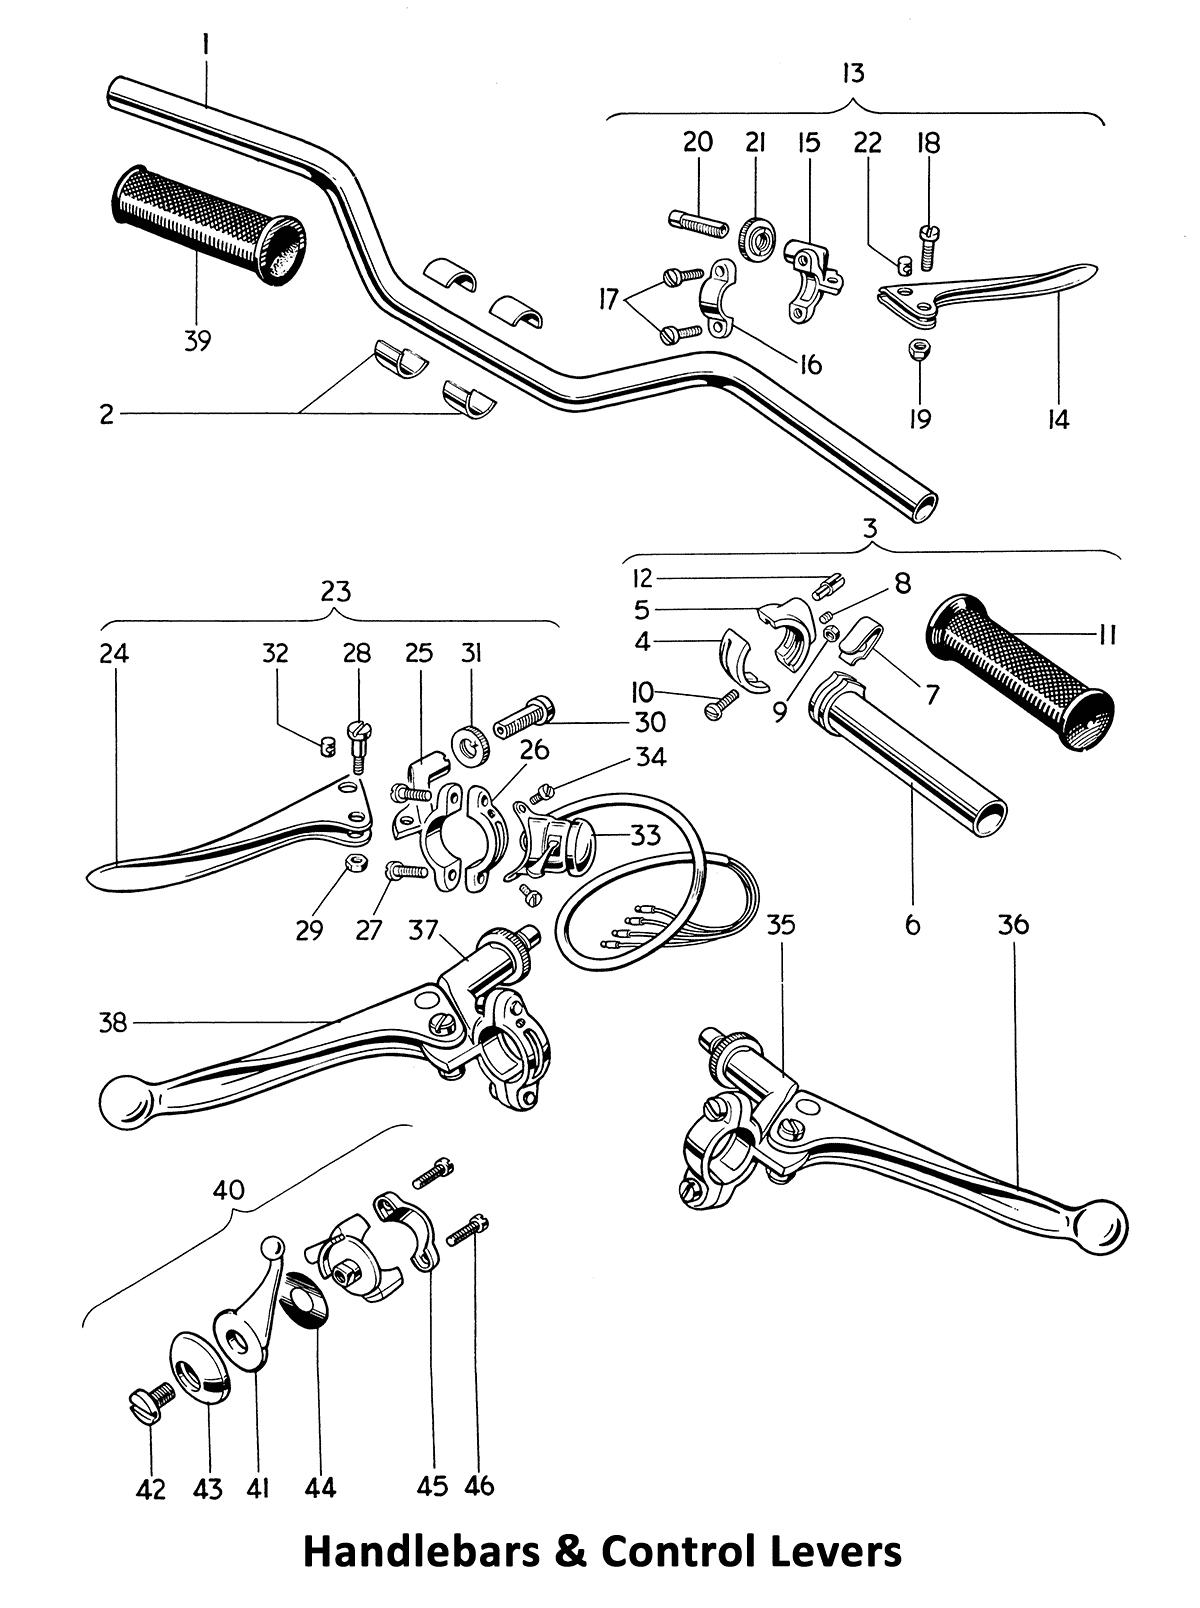 1964 Triumph 650 Twins T120, TR6, 6T handlebars & control levers